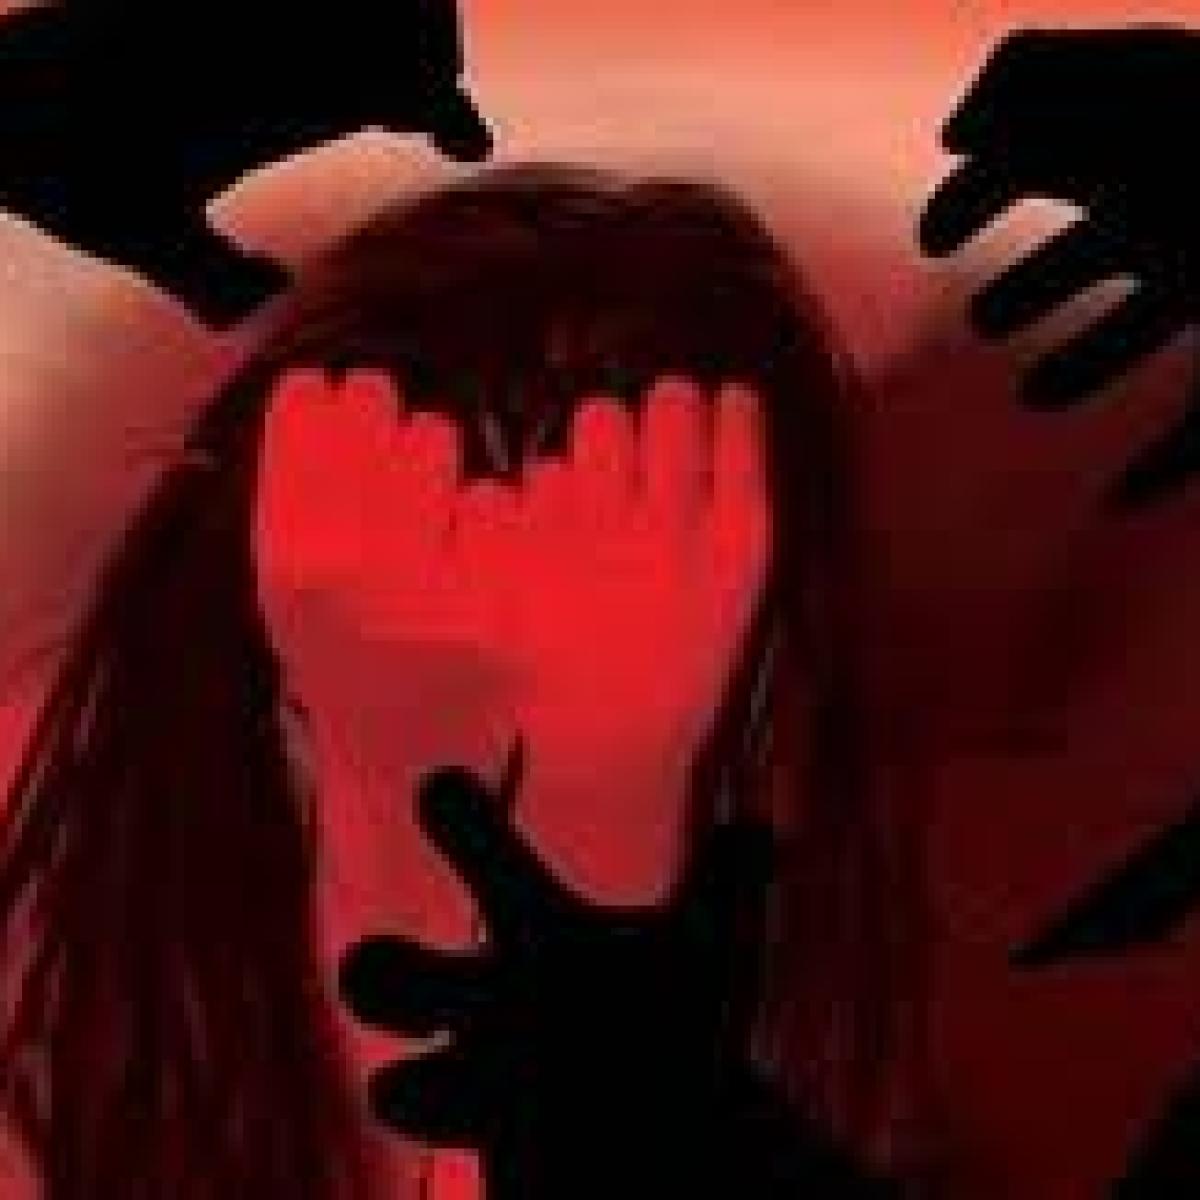 Ujjain: Miscreants get 10 year rigorous imprisonment for raping minor girl